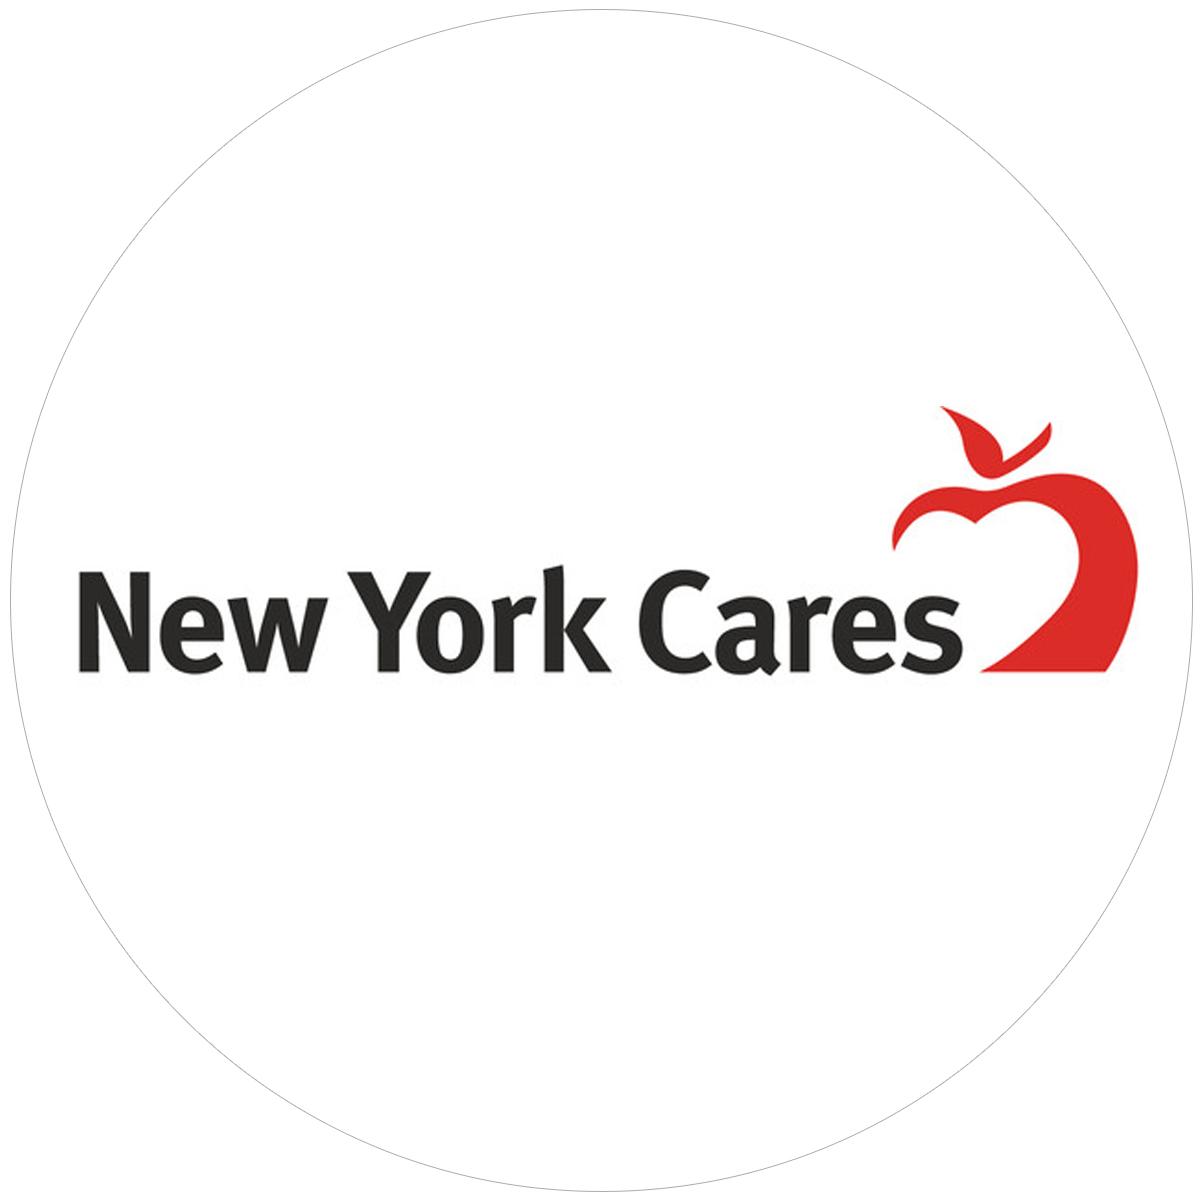 NYCares.jpg